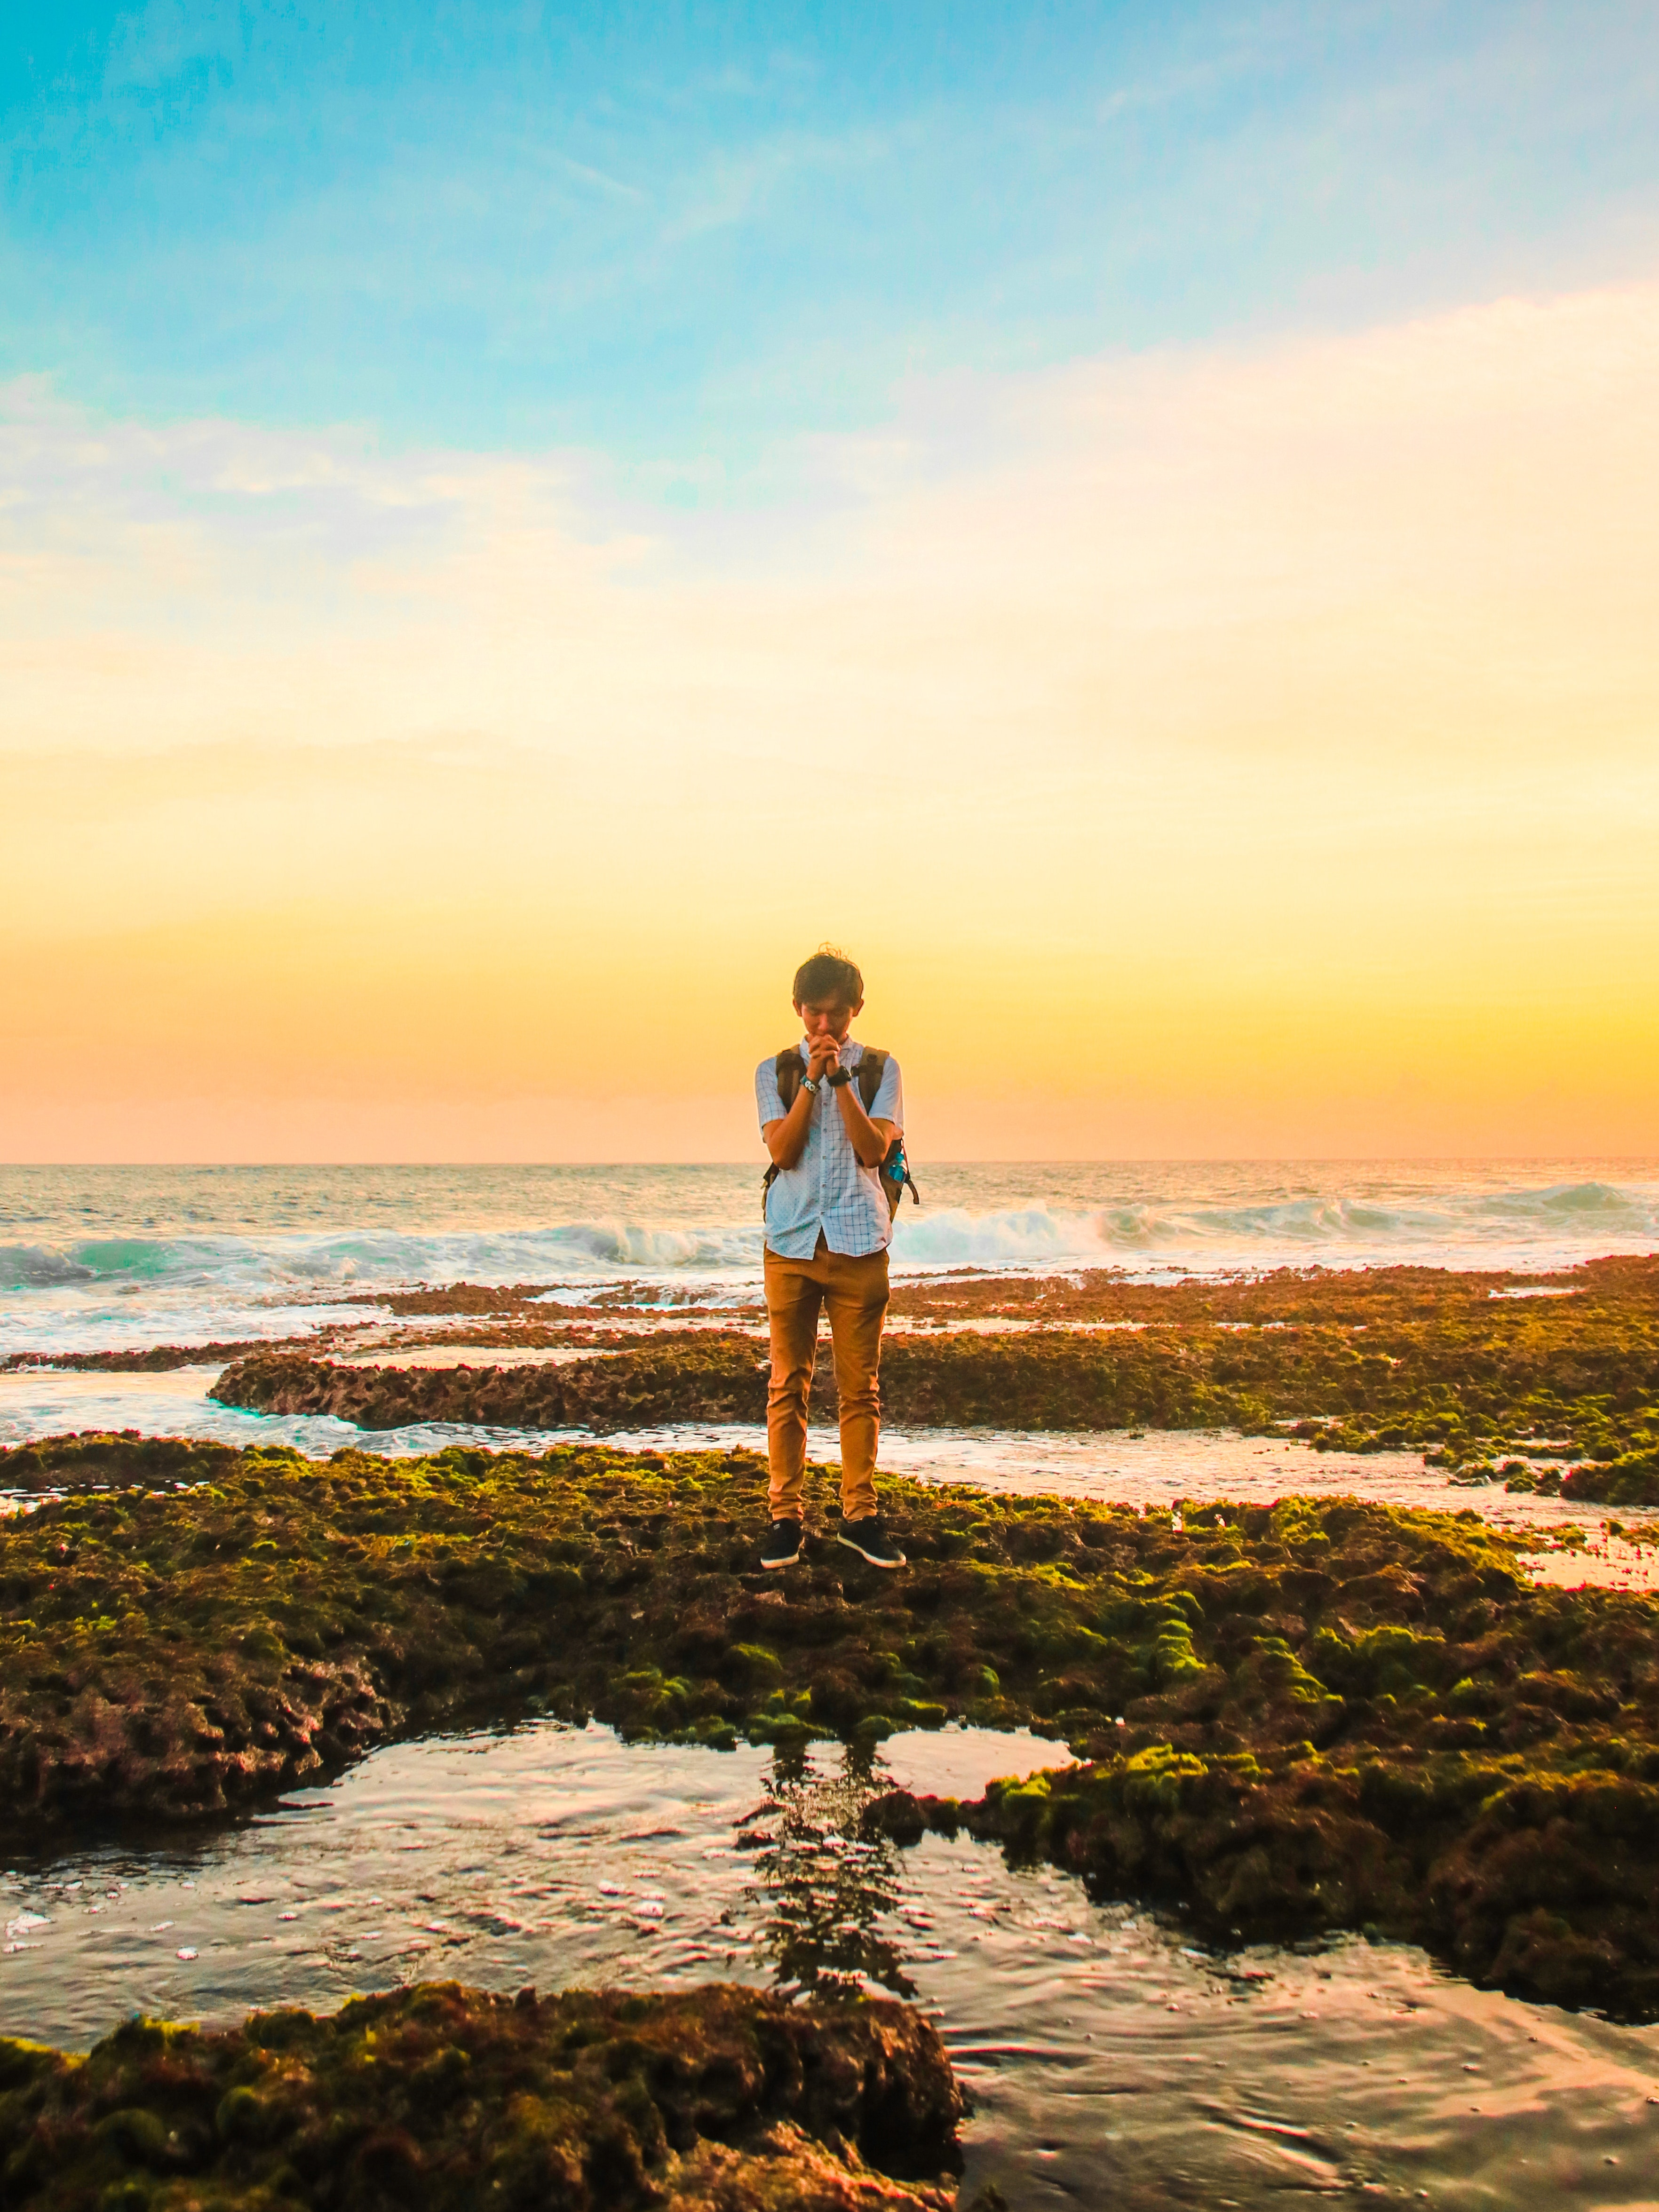 Man standing on rocks near beach during golden hour photo